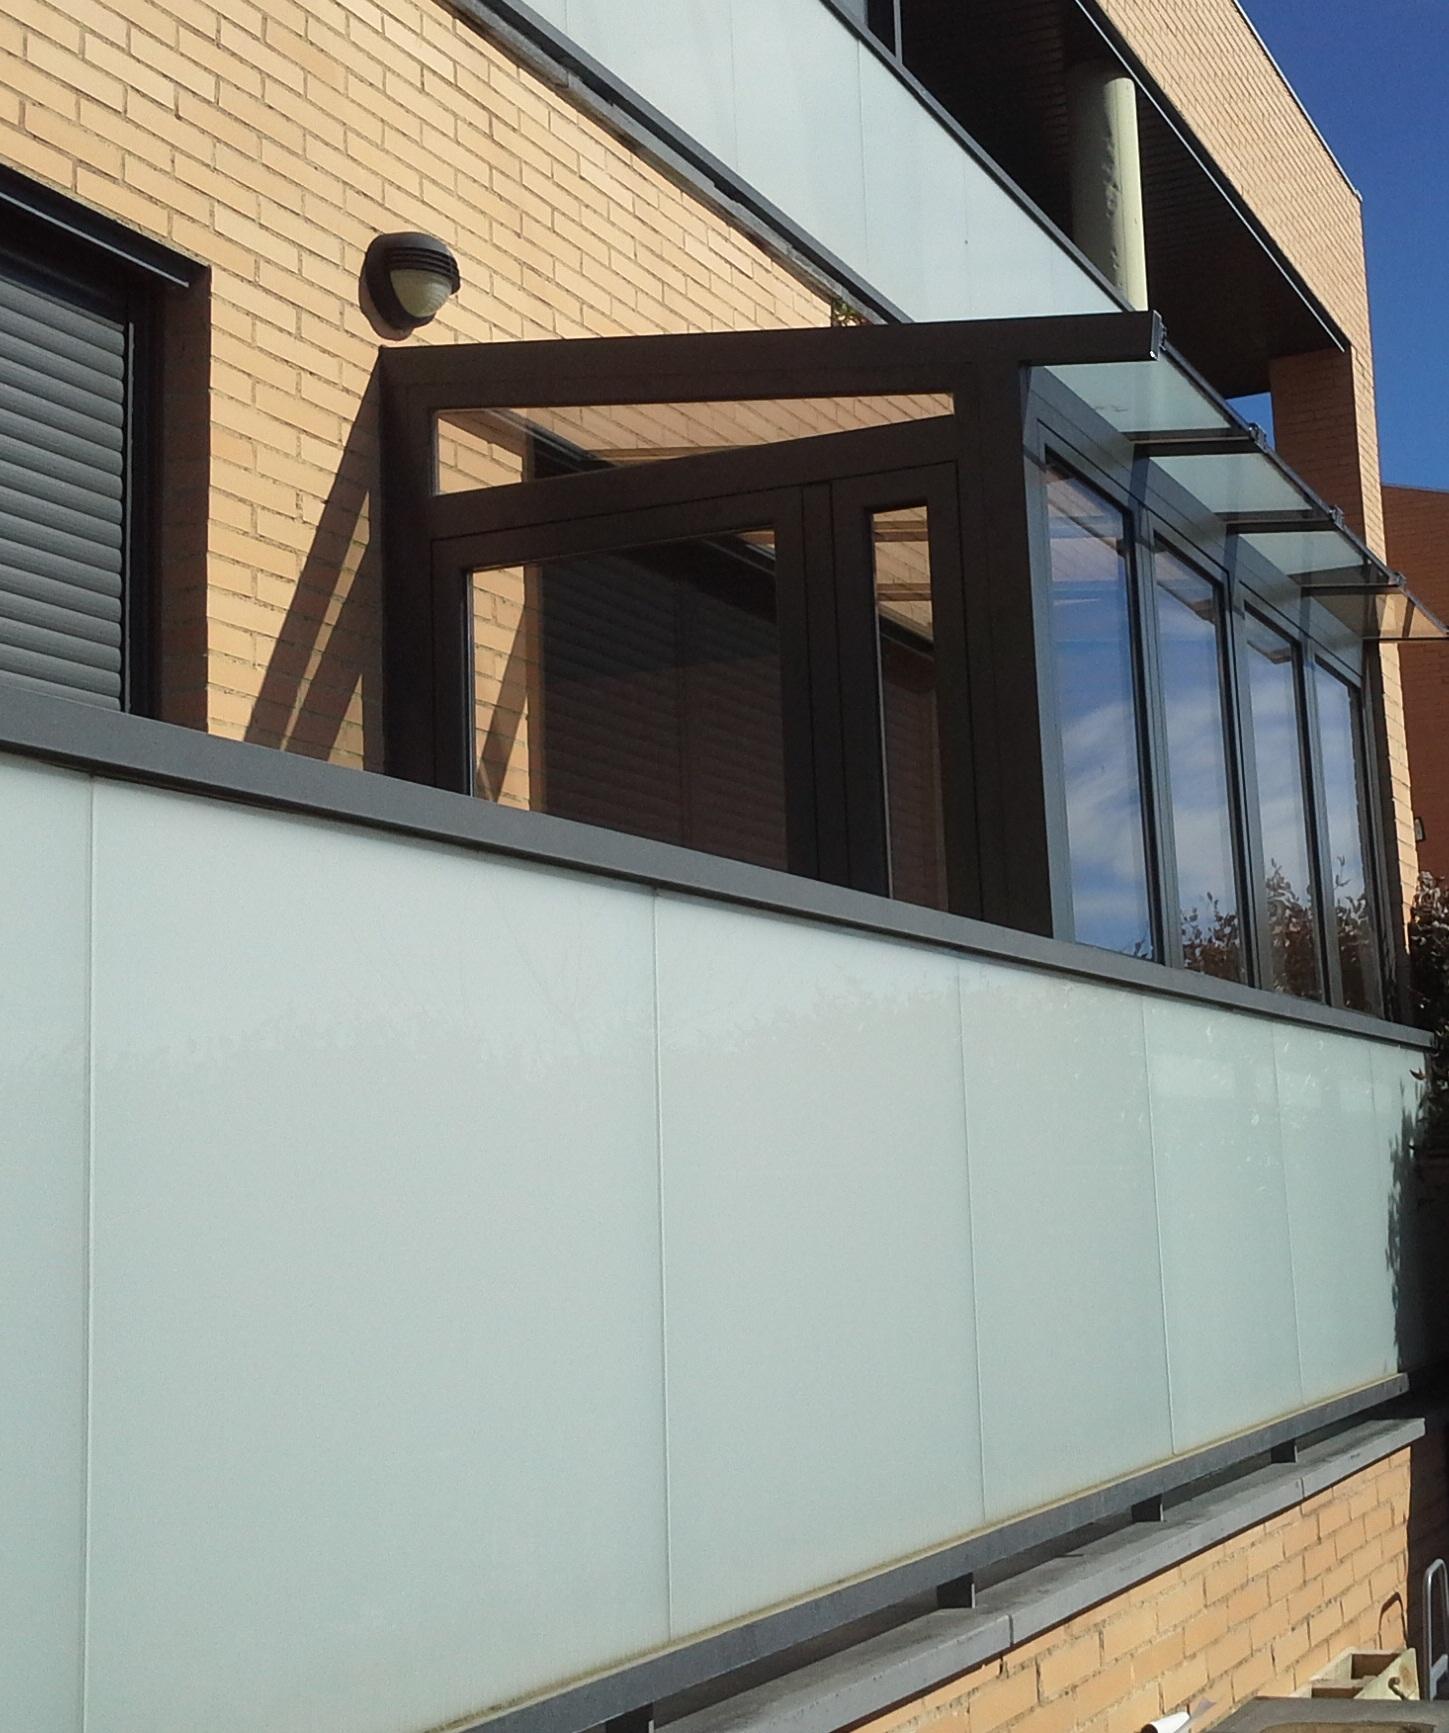 Cerramiento de ventanas de aluminio montajes de aluminio dg - Cerramiento de aluminio ...